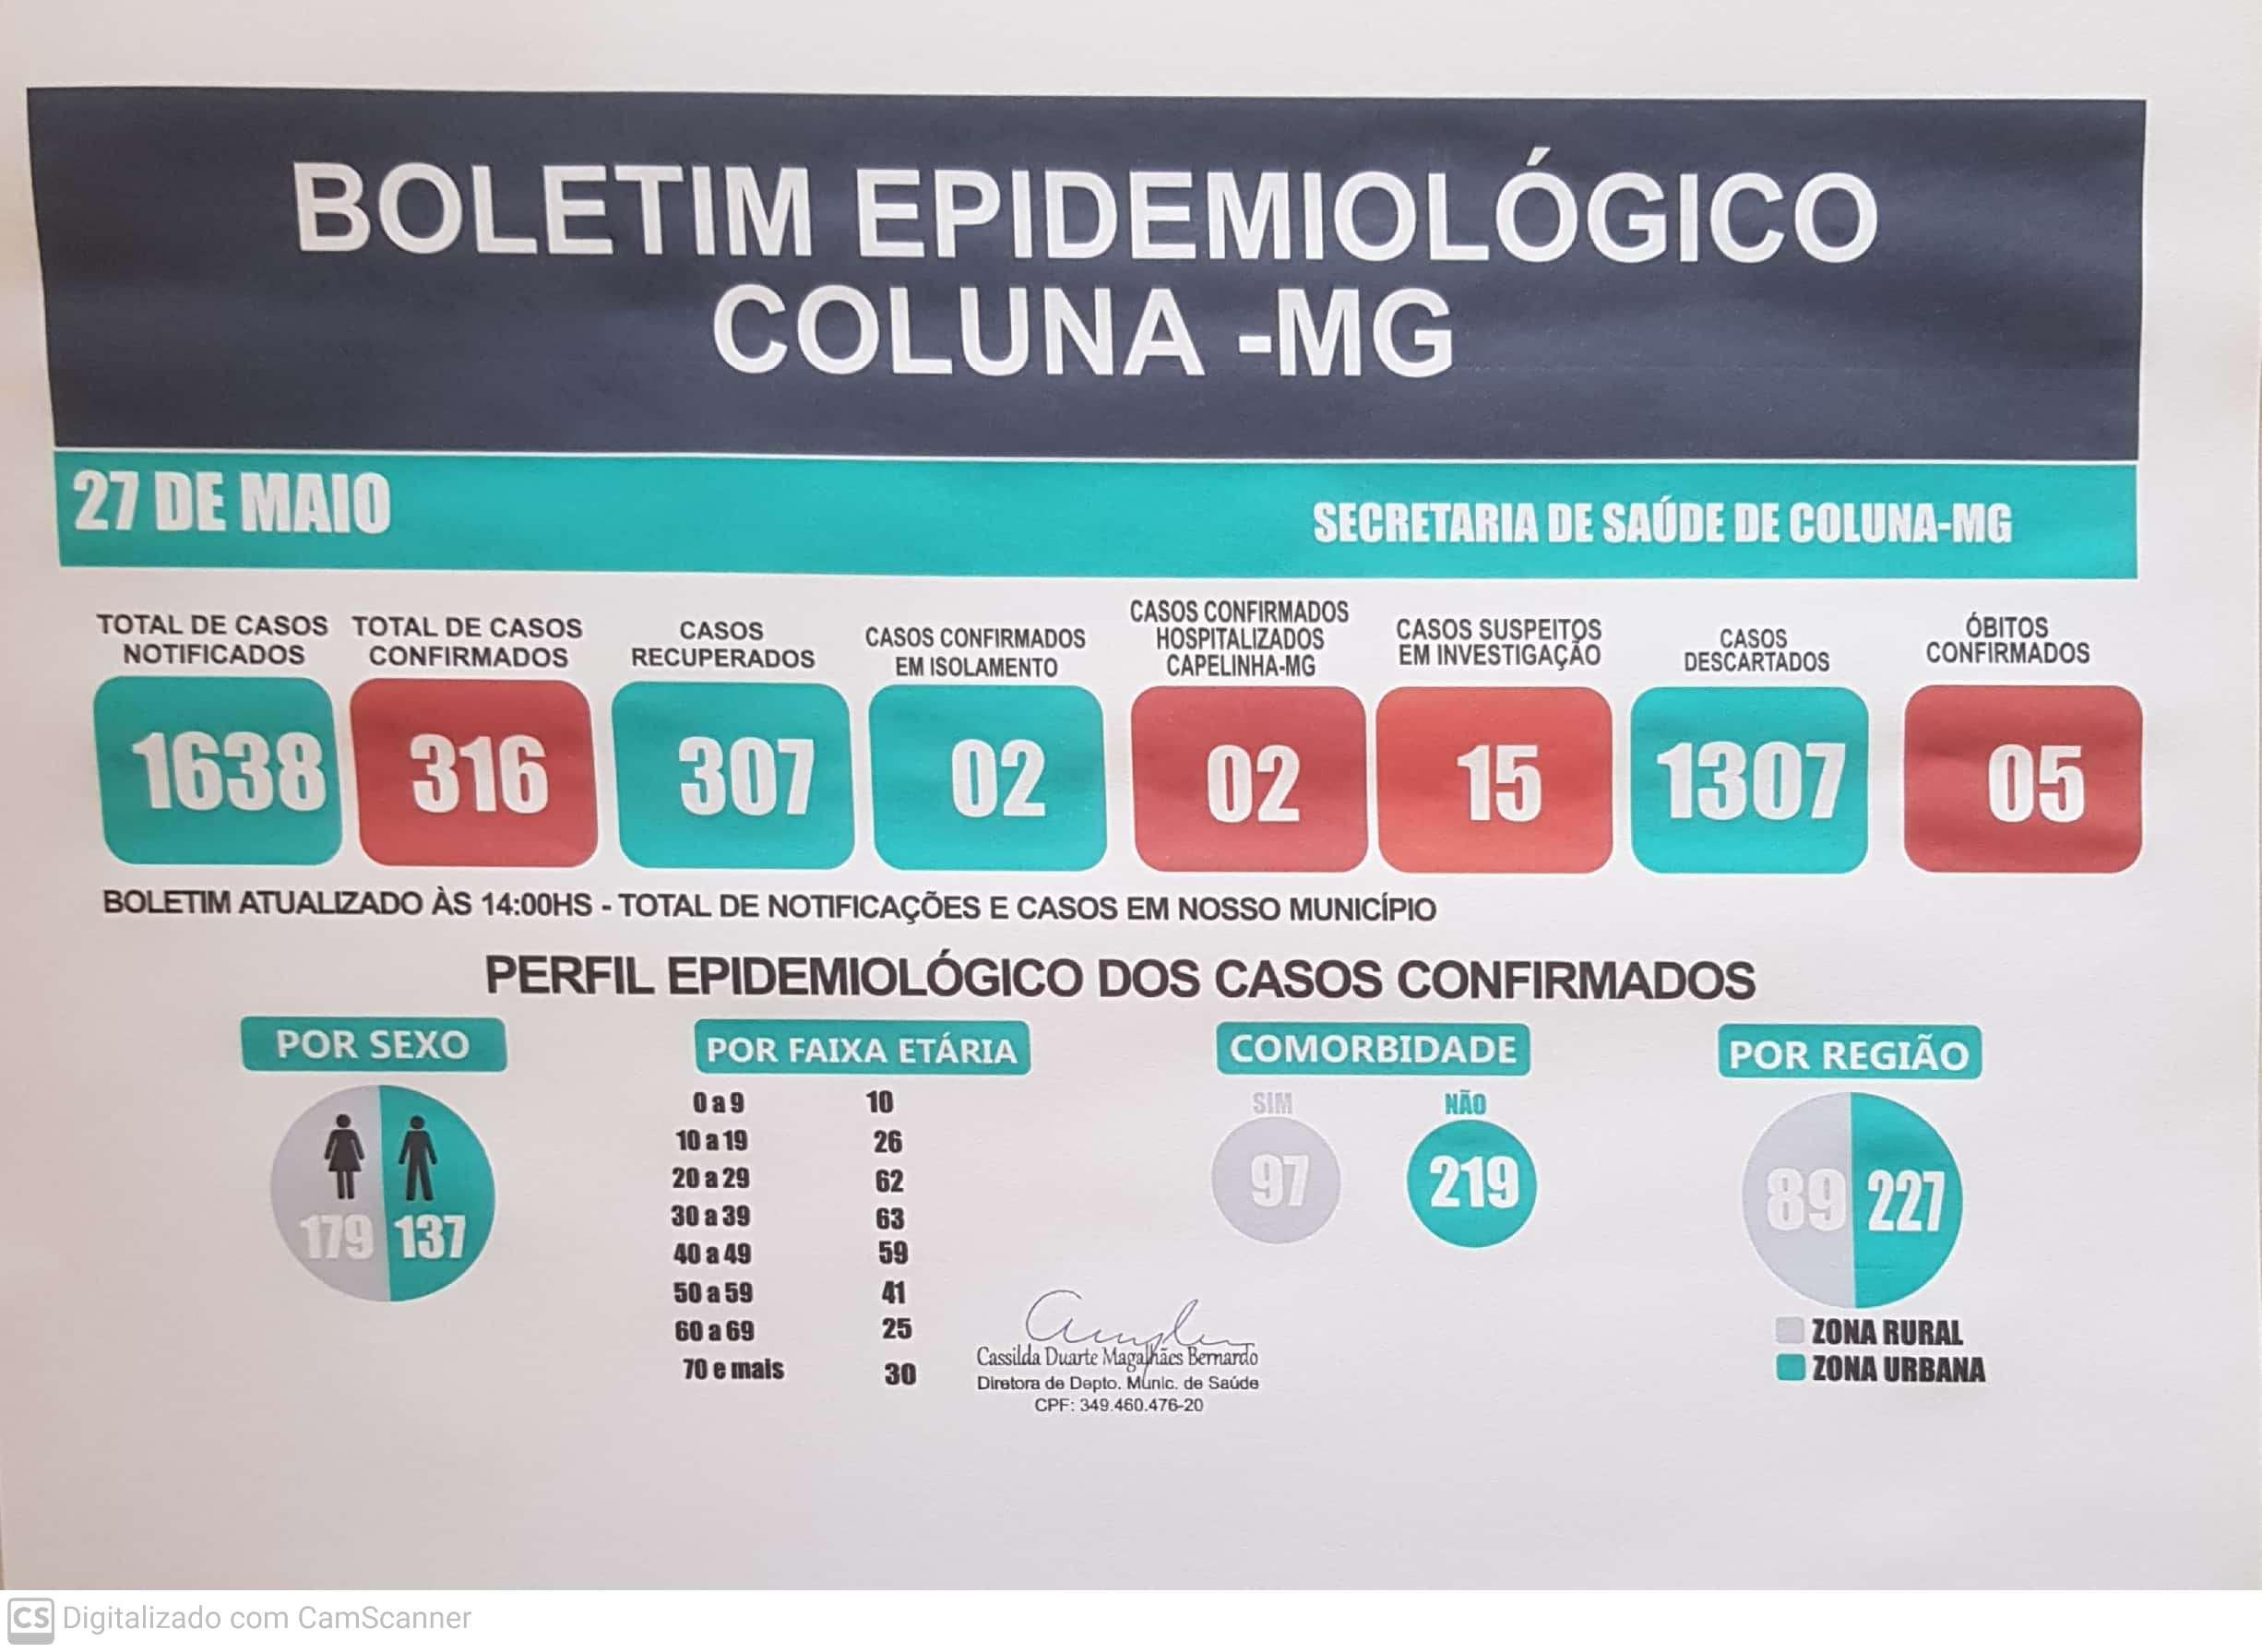 BOLETIM EPIDEMIOLÓGICO COLUNA - MG 27/05/2021